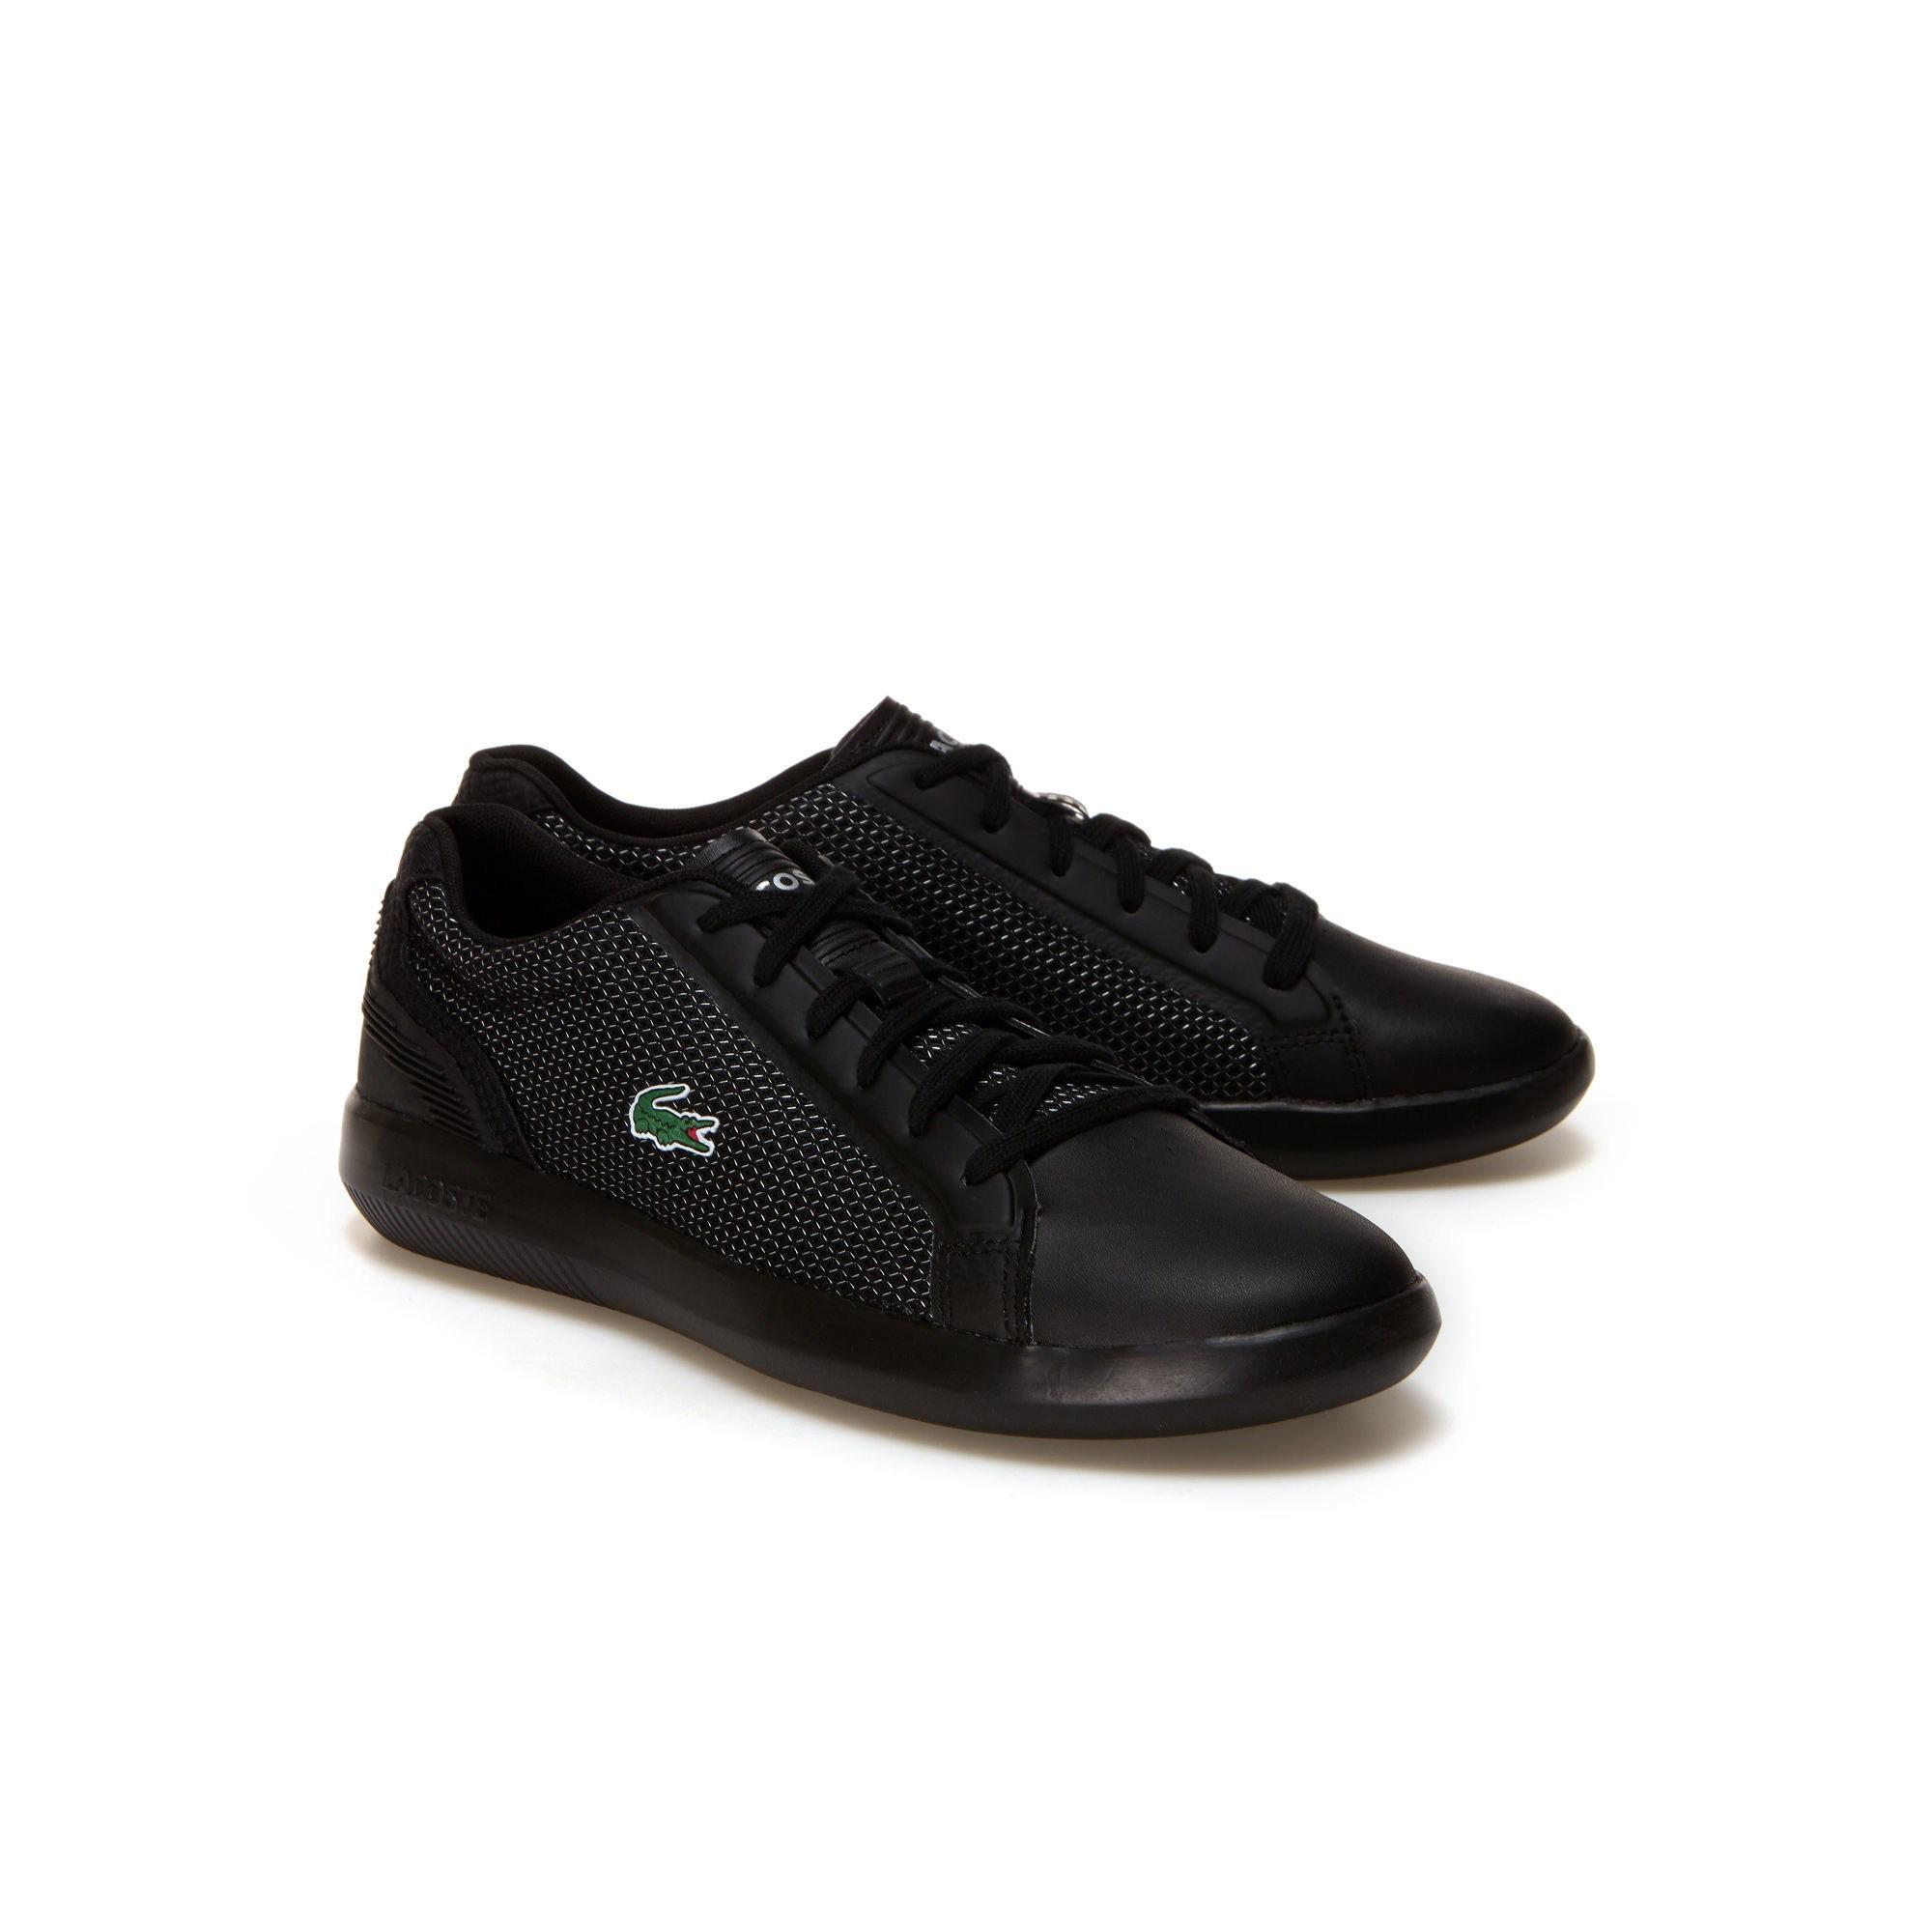 Lacoste кросівки чоловічі Avantor